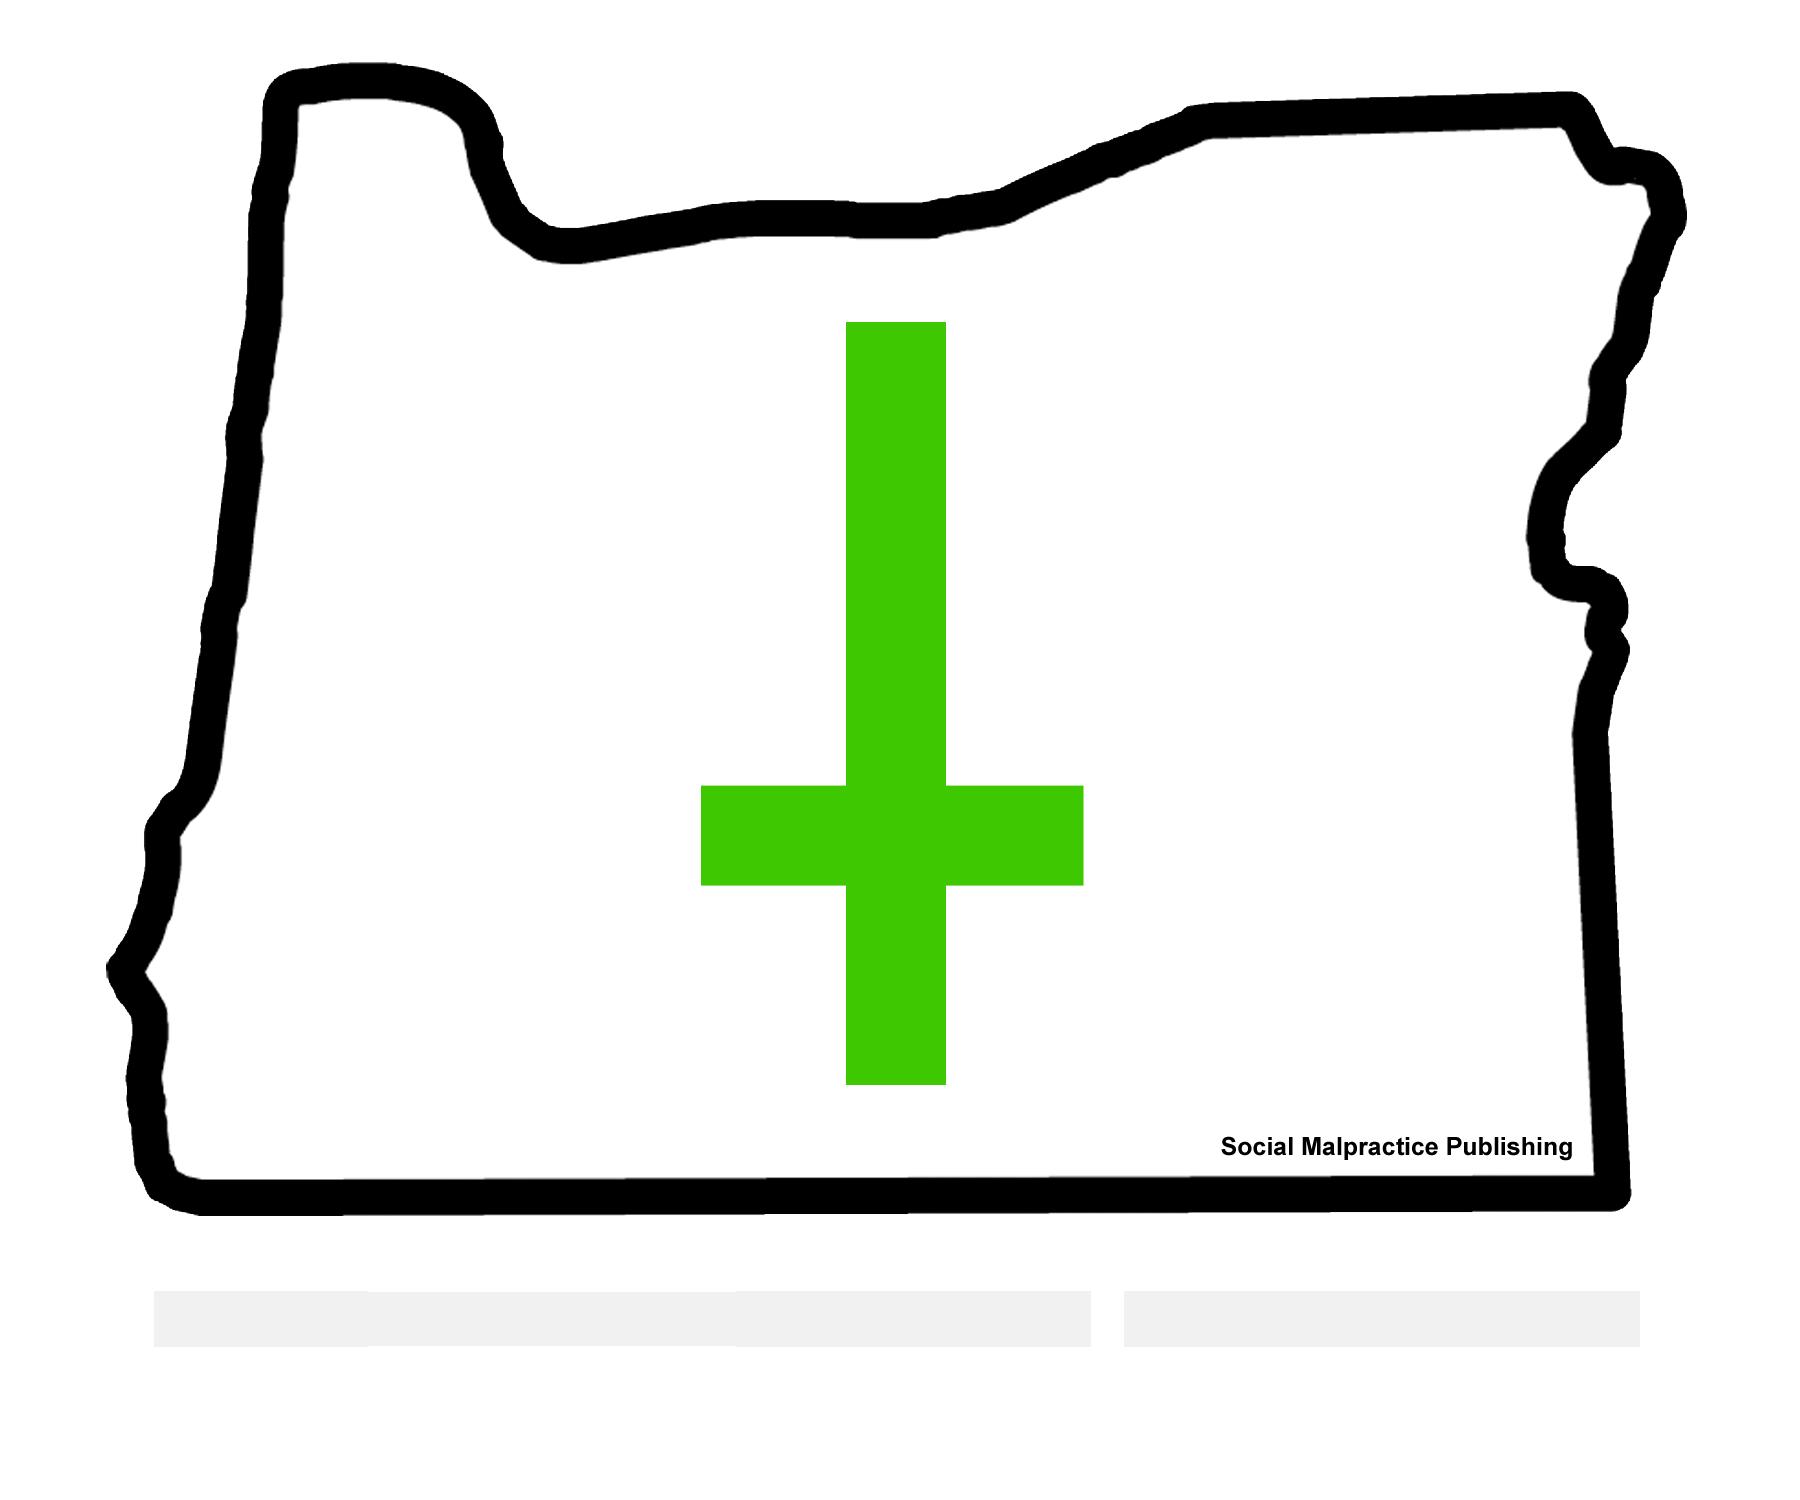 Social Malpractice Publishing Logo.png